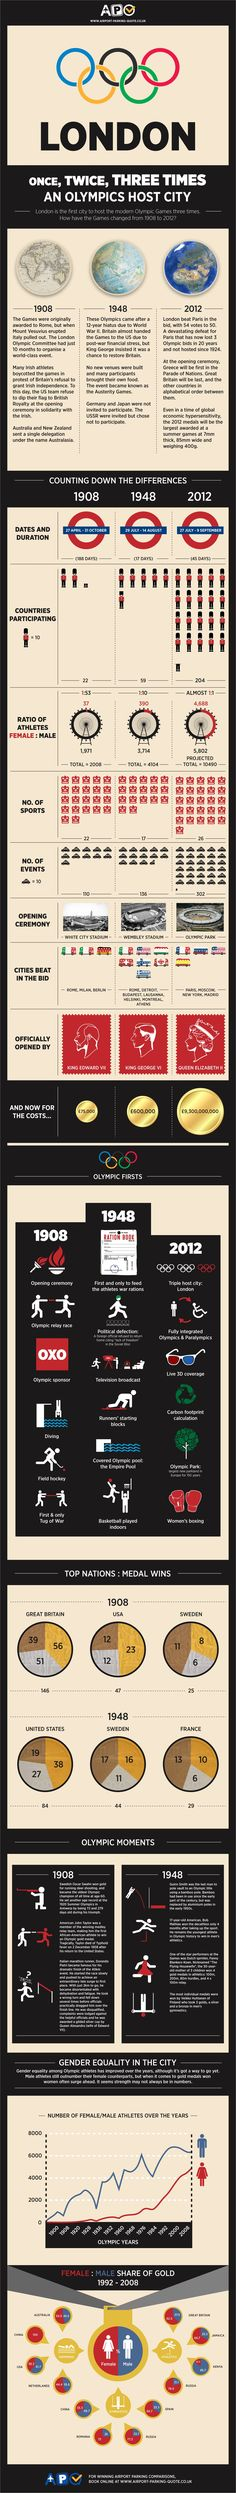 Infographics on LONDON OLYMPICS 2012 | AnimHuT